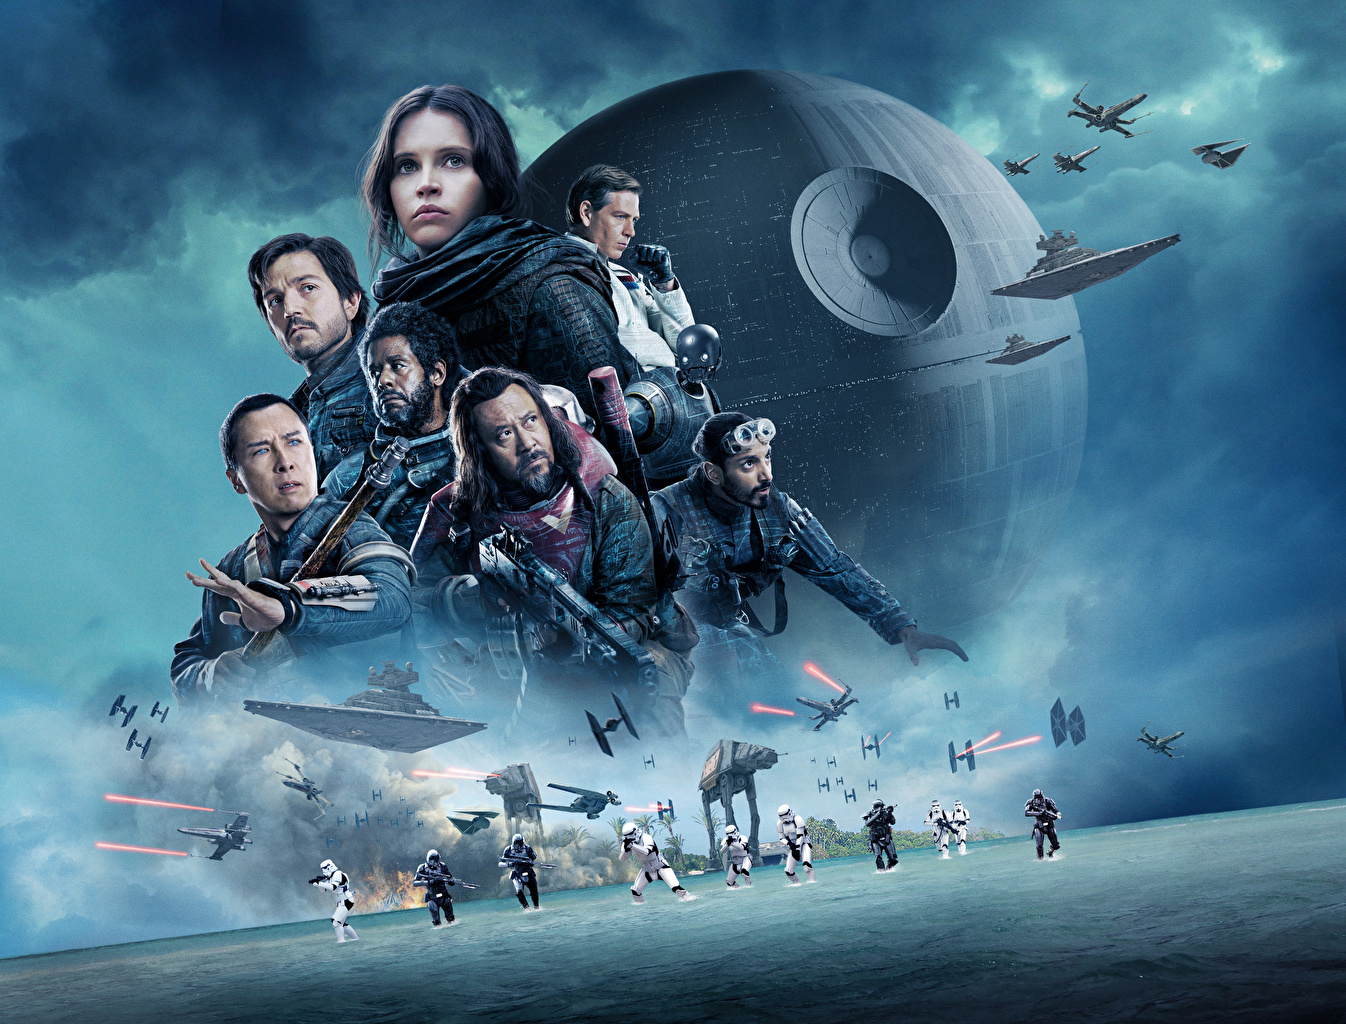 Images Celebrities Rogue One: A Star Wars Story Clone trooper Warriors Forest Whitaker, Ben Mendelsohn, Donnie Yen, Diego Luna, Riz Ahmed, Wen Jiang Felicity Jones Movies warrior film